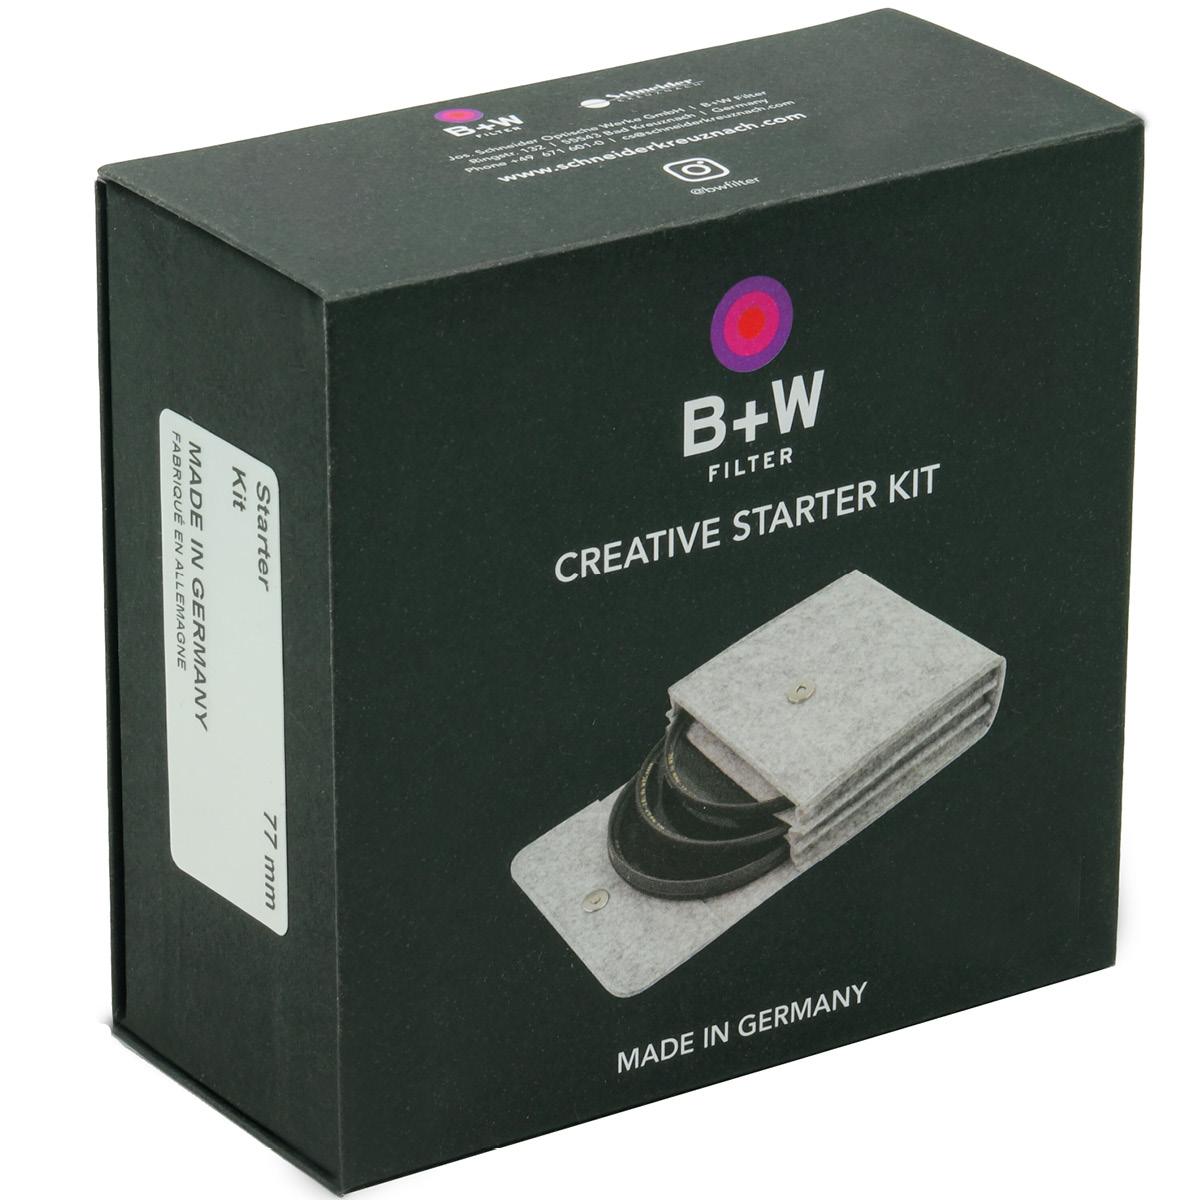 B+W Creative Starter Kit 52 mm